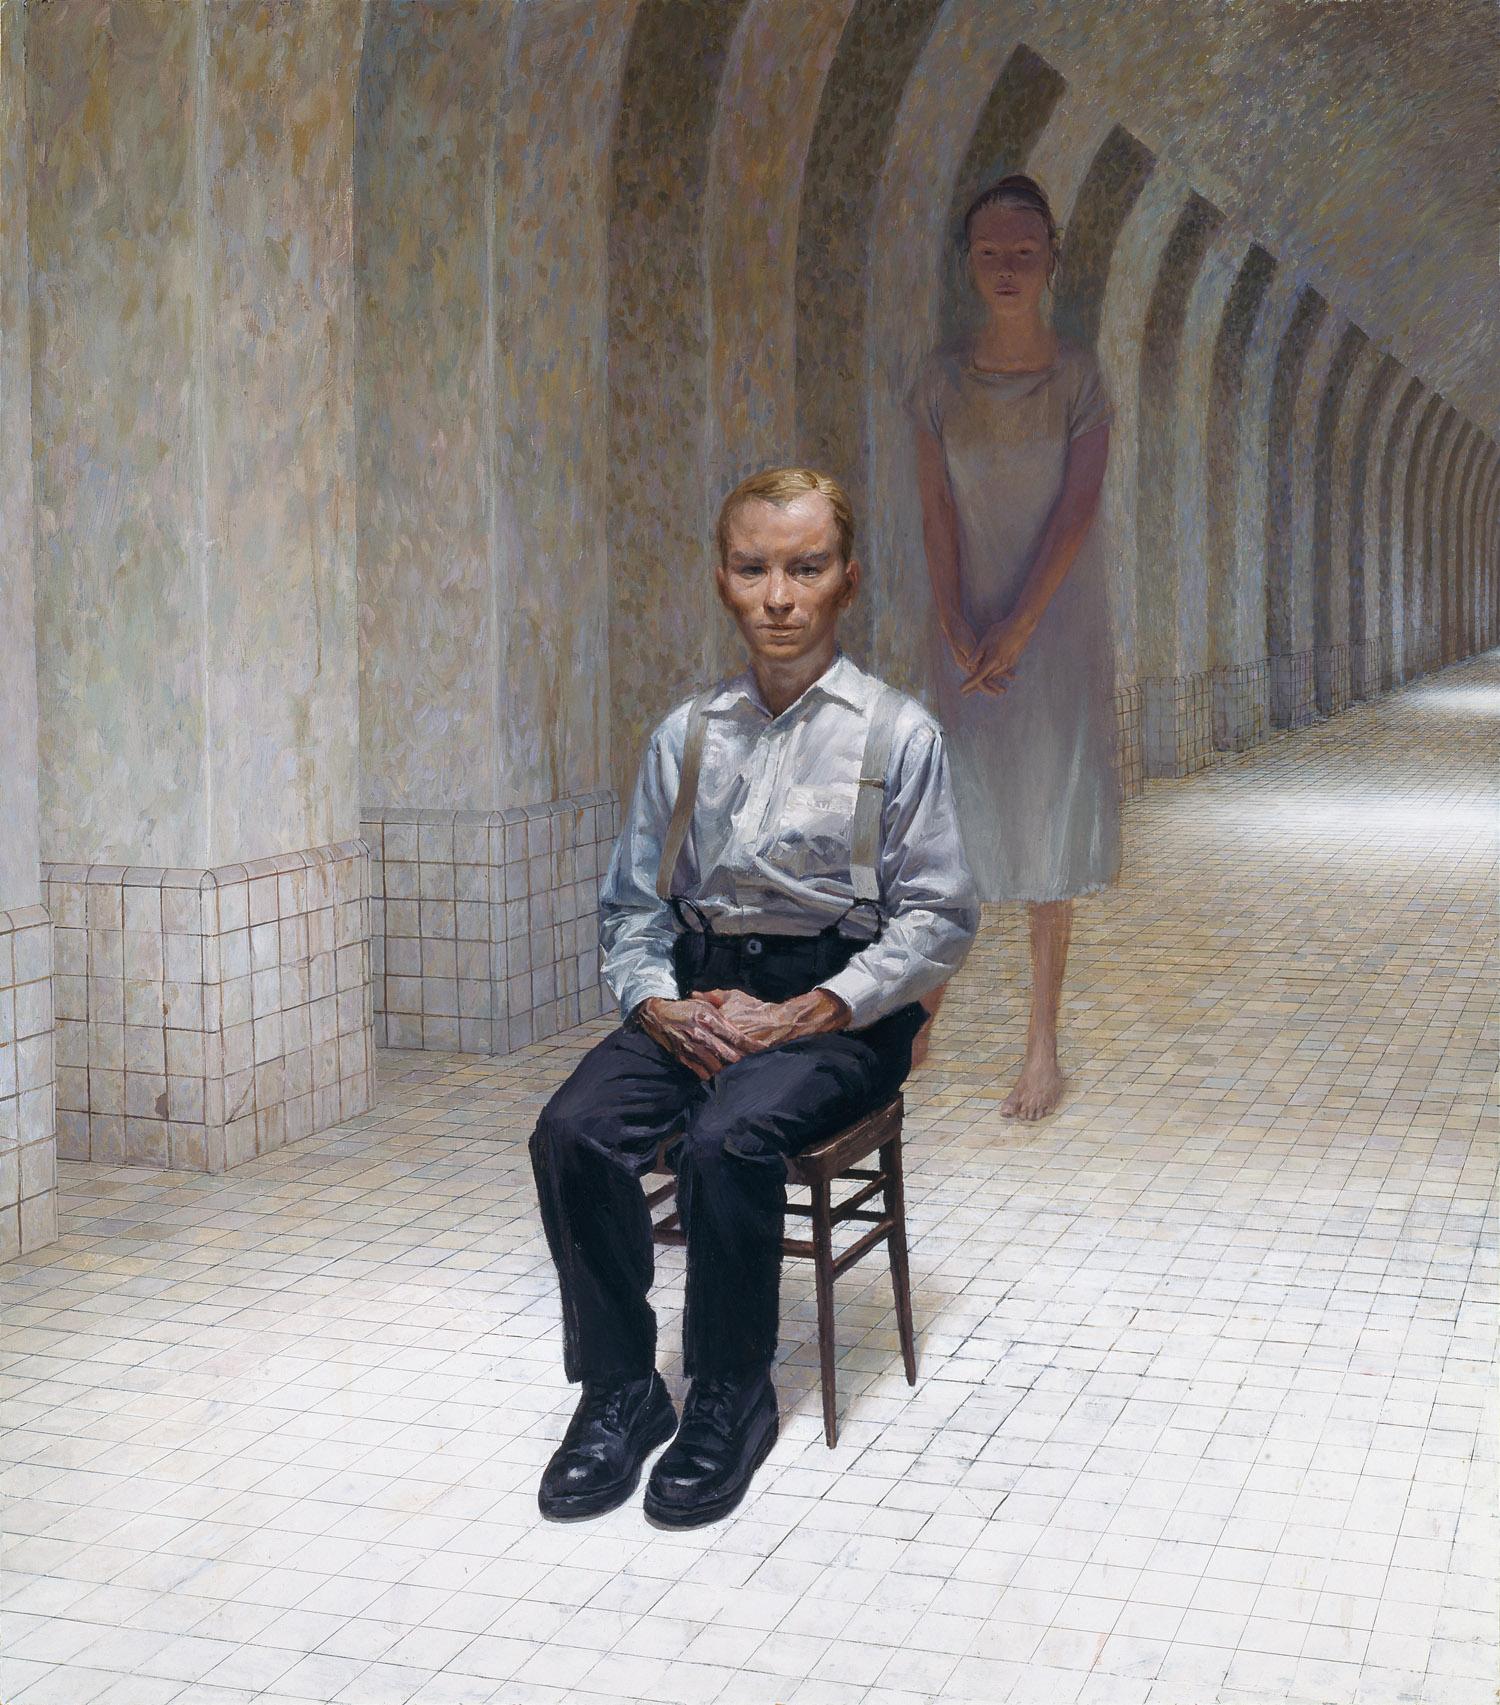 Hallway , oil on panel, 55 x 48 in, 1999